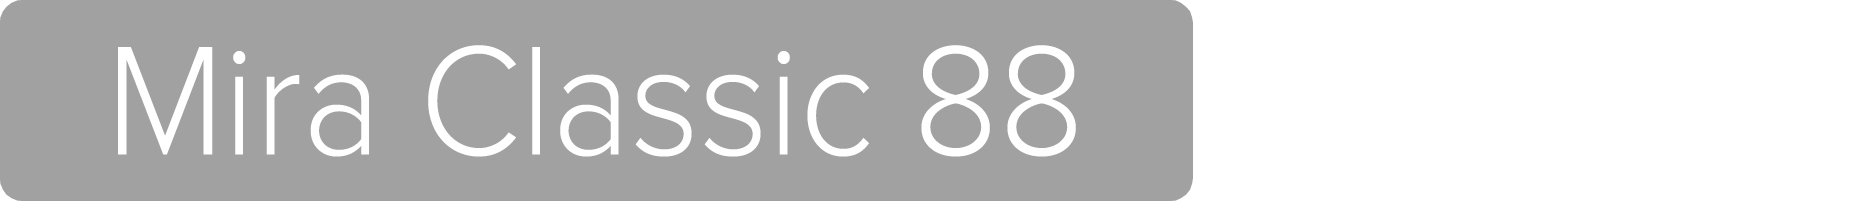 32_Sublime-Windows_NAME_Mira-Classic-88.jpg